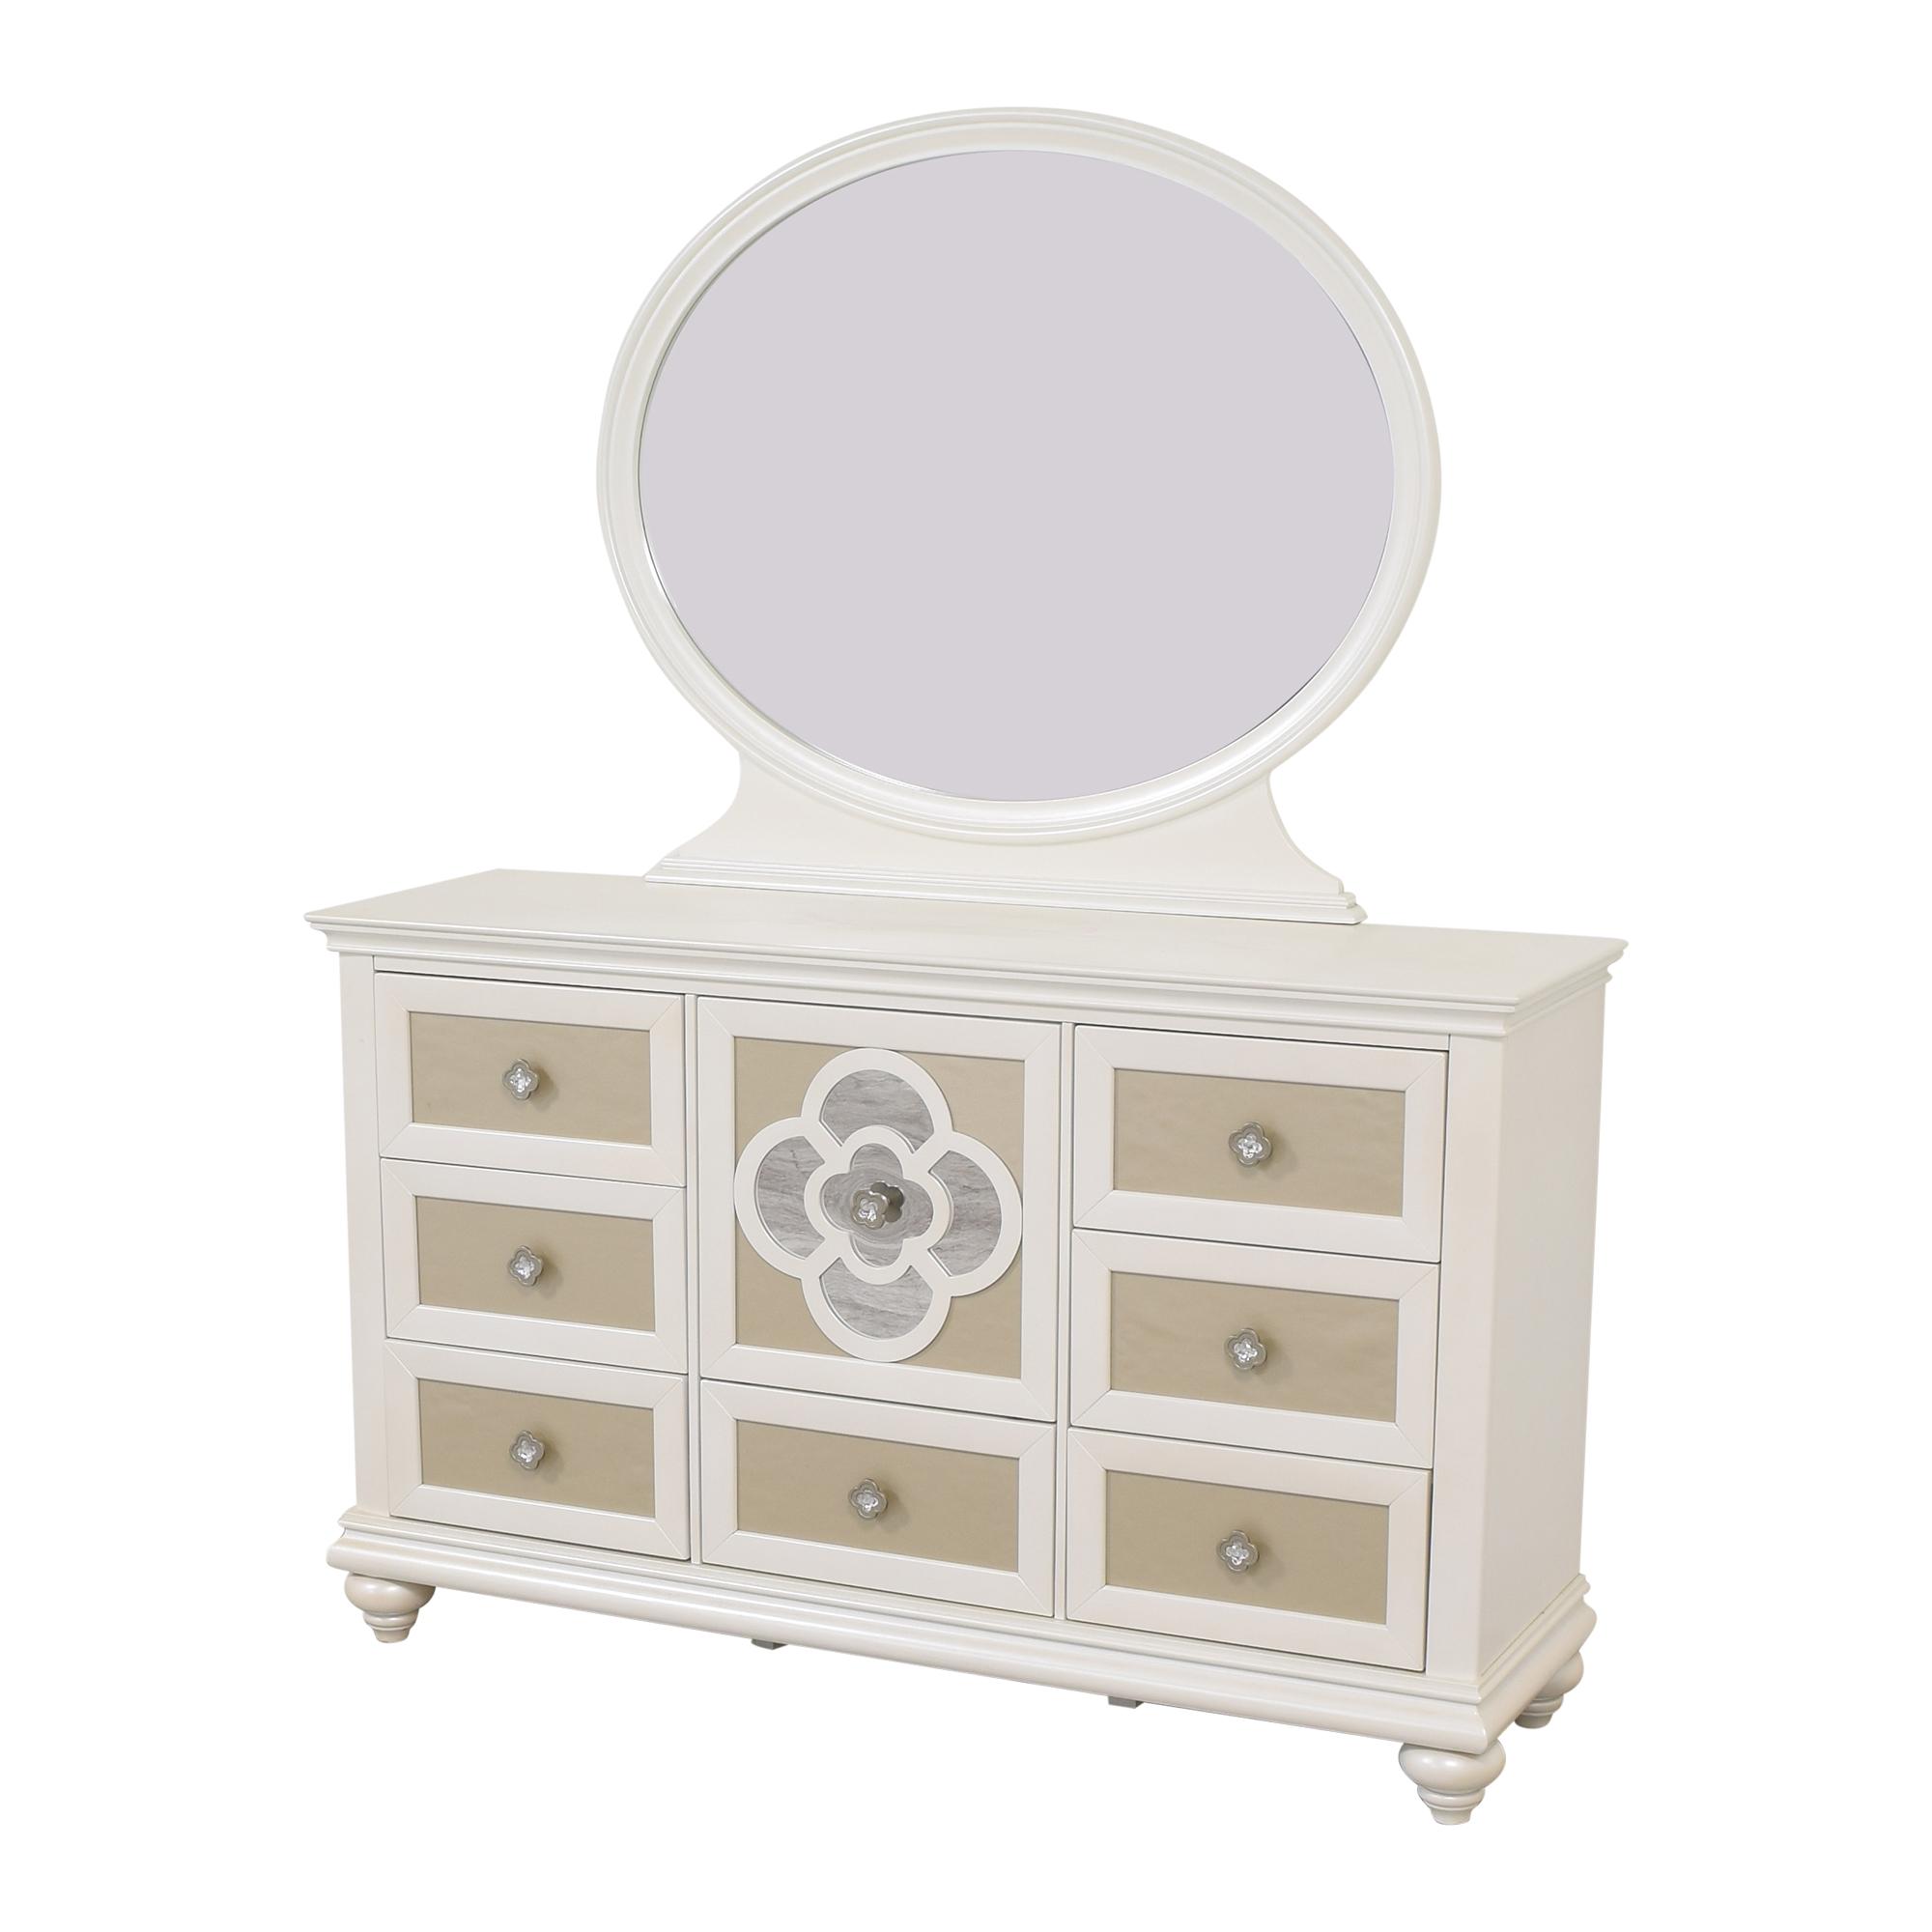 Najarian Furniture Raymour & Flanigan Paris Dresser with Mirror used